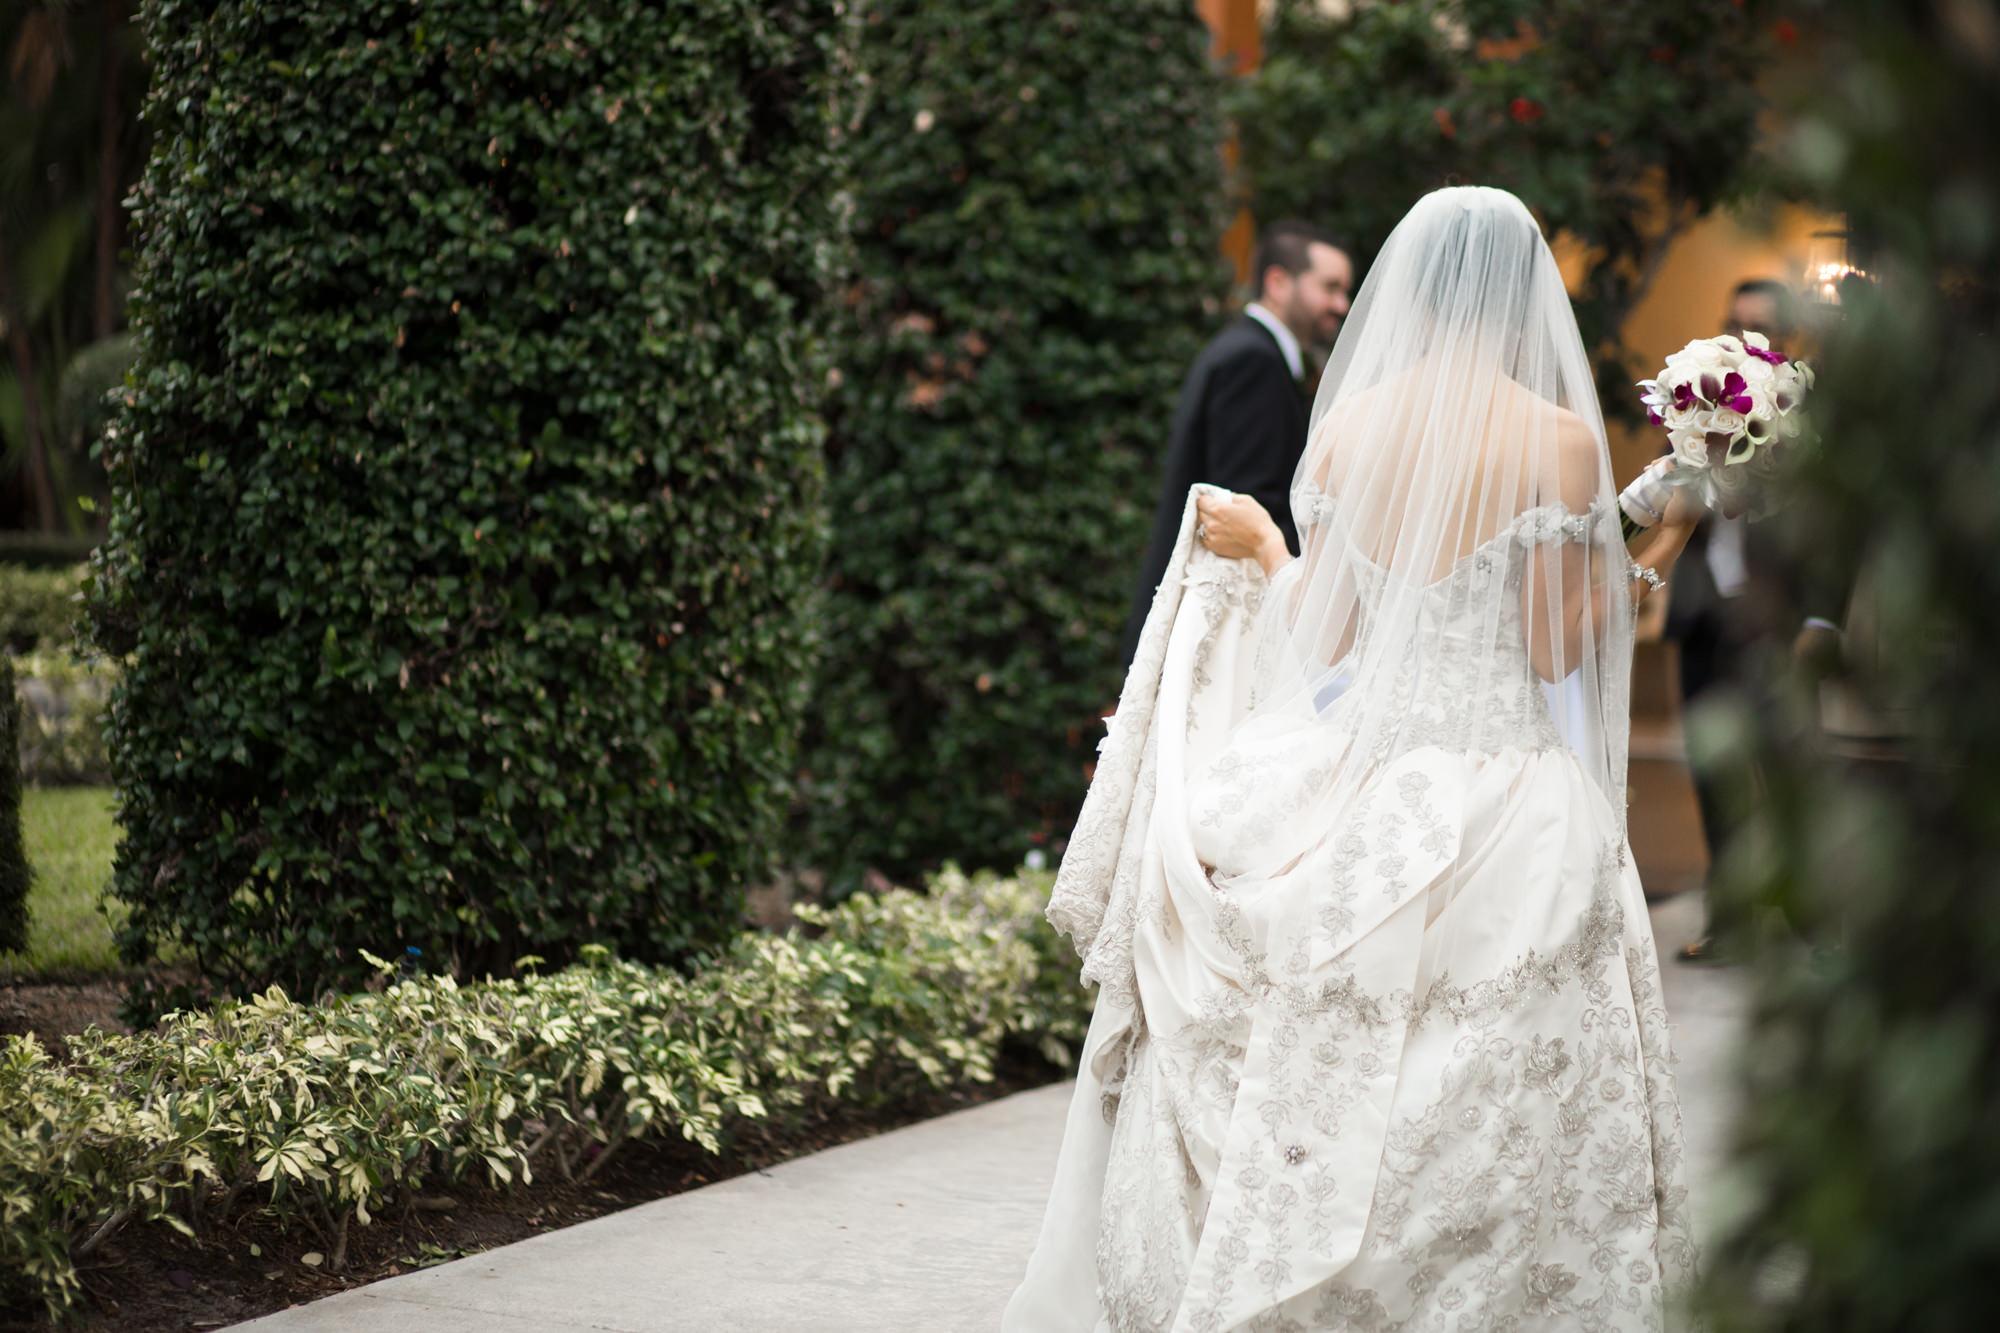 Benvenuto_Wedding_catholic_Florida_Bride-Groom-78.jpg